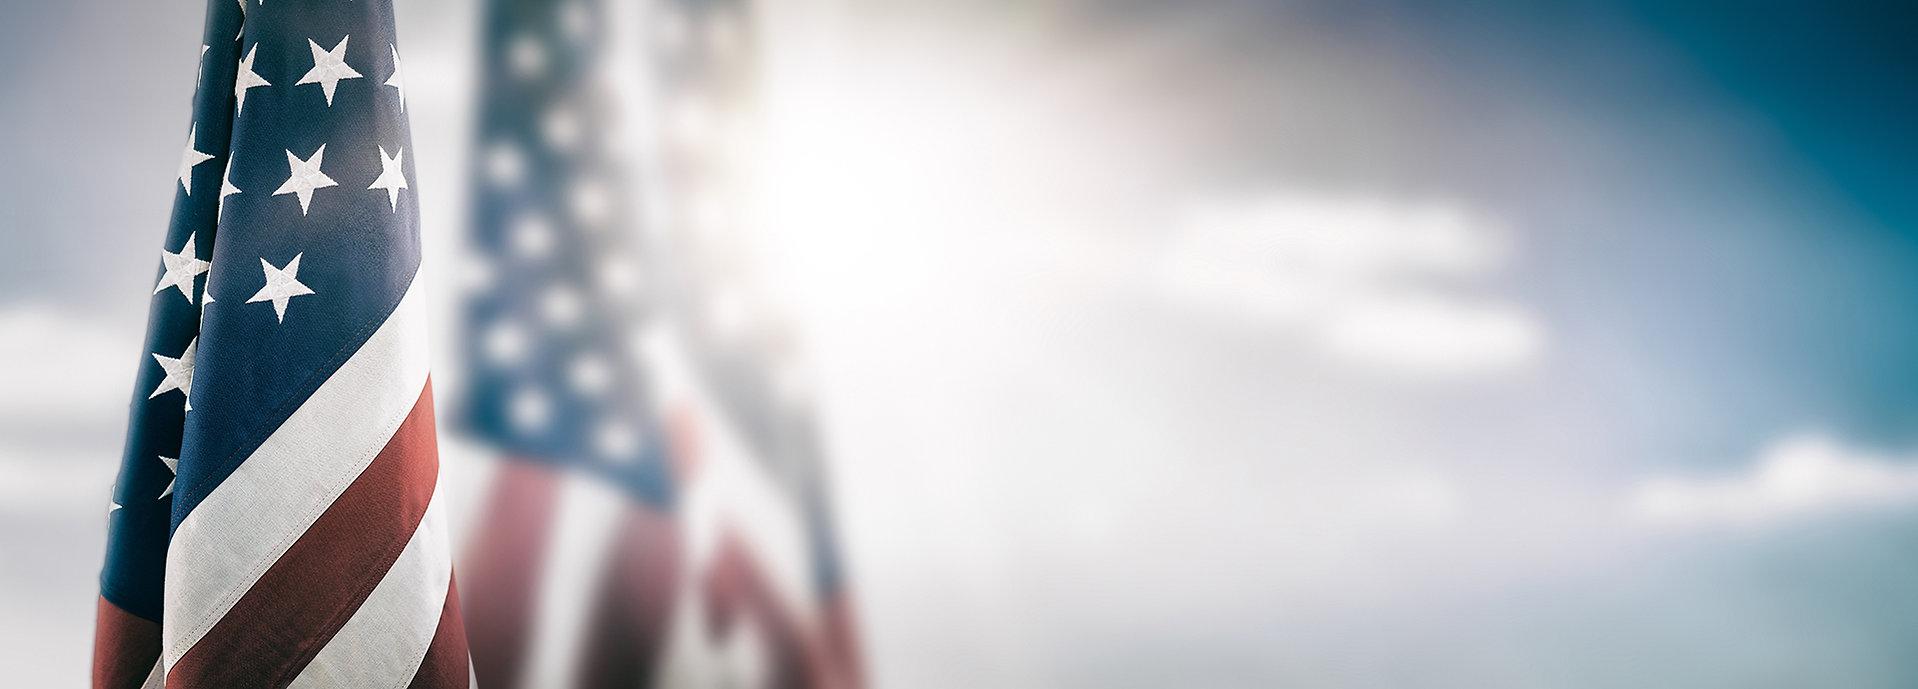 american flag2.jpg